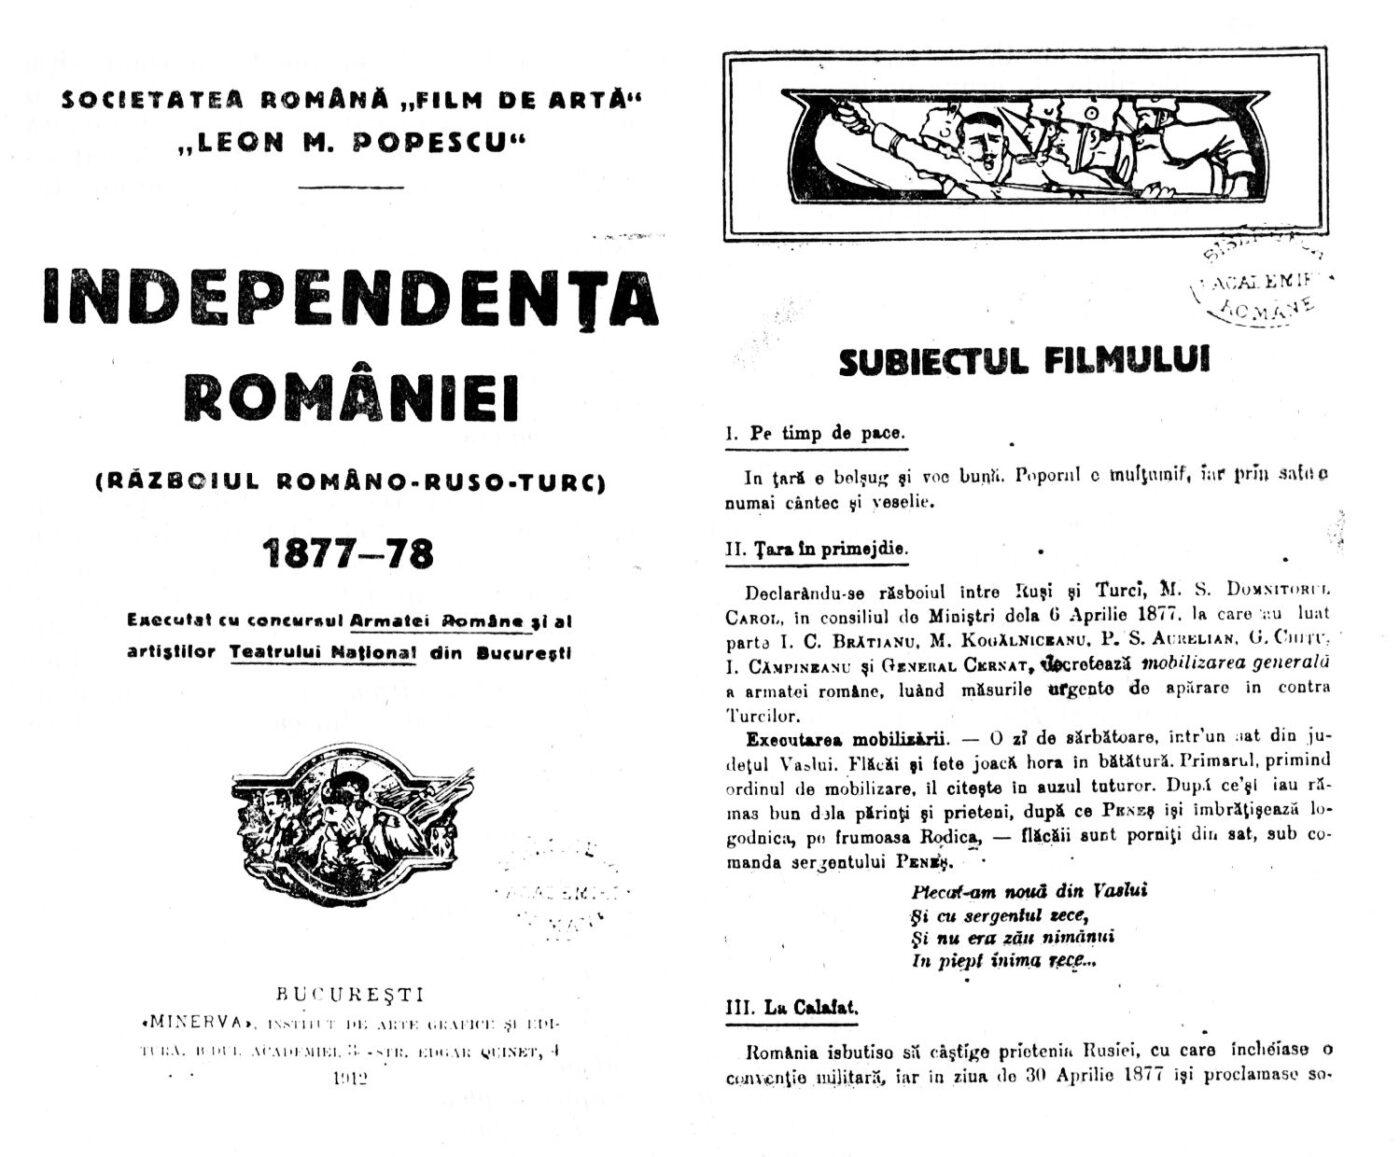 The Independence of Romania ( 1912) - Independenţa României, silent film